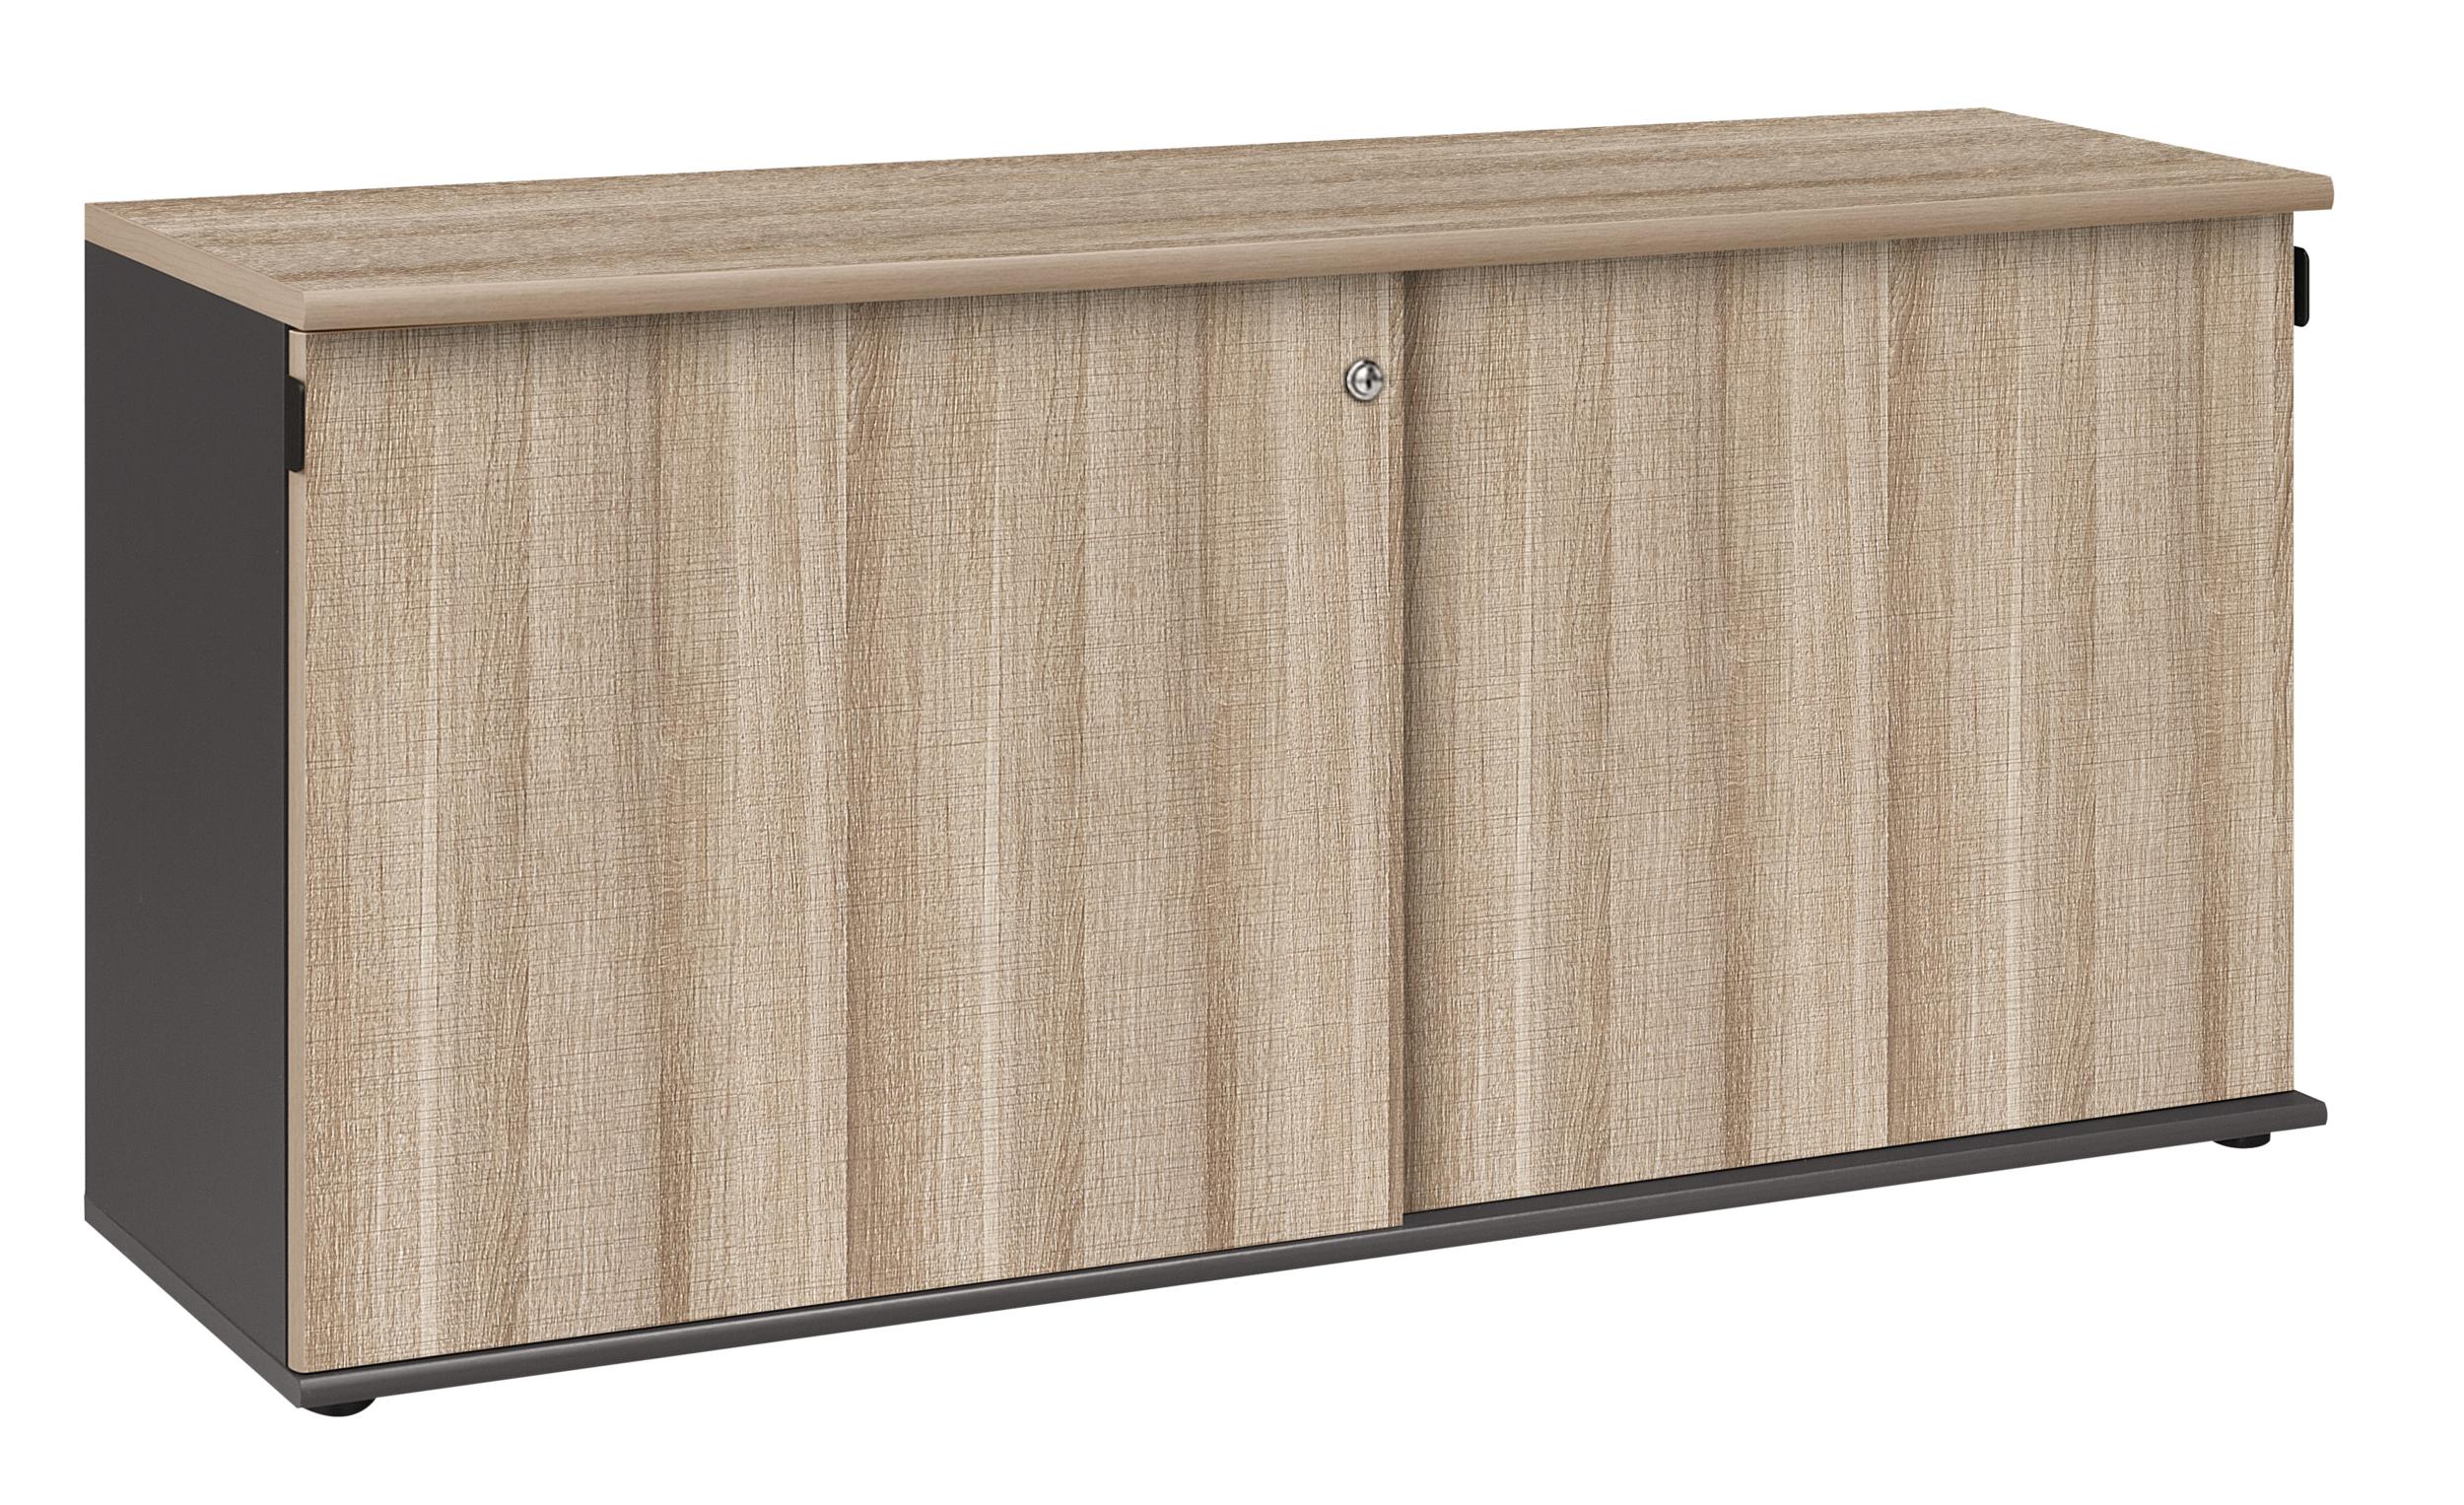 Jazz ch ne gris cr dence rangements meubles bas for Meuble bureau jazz